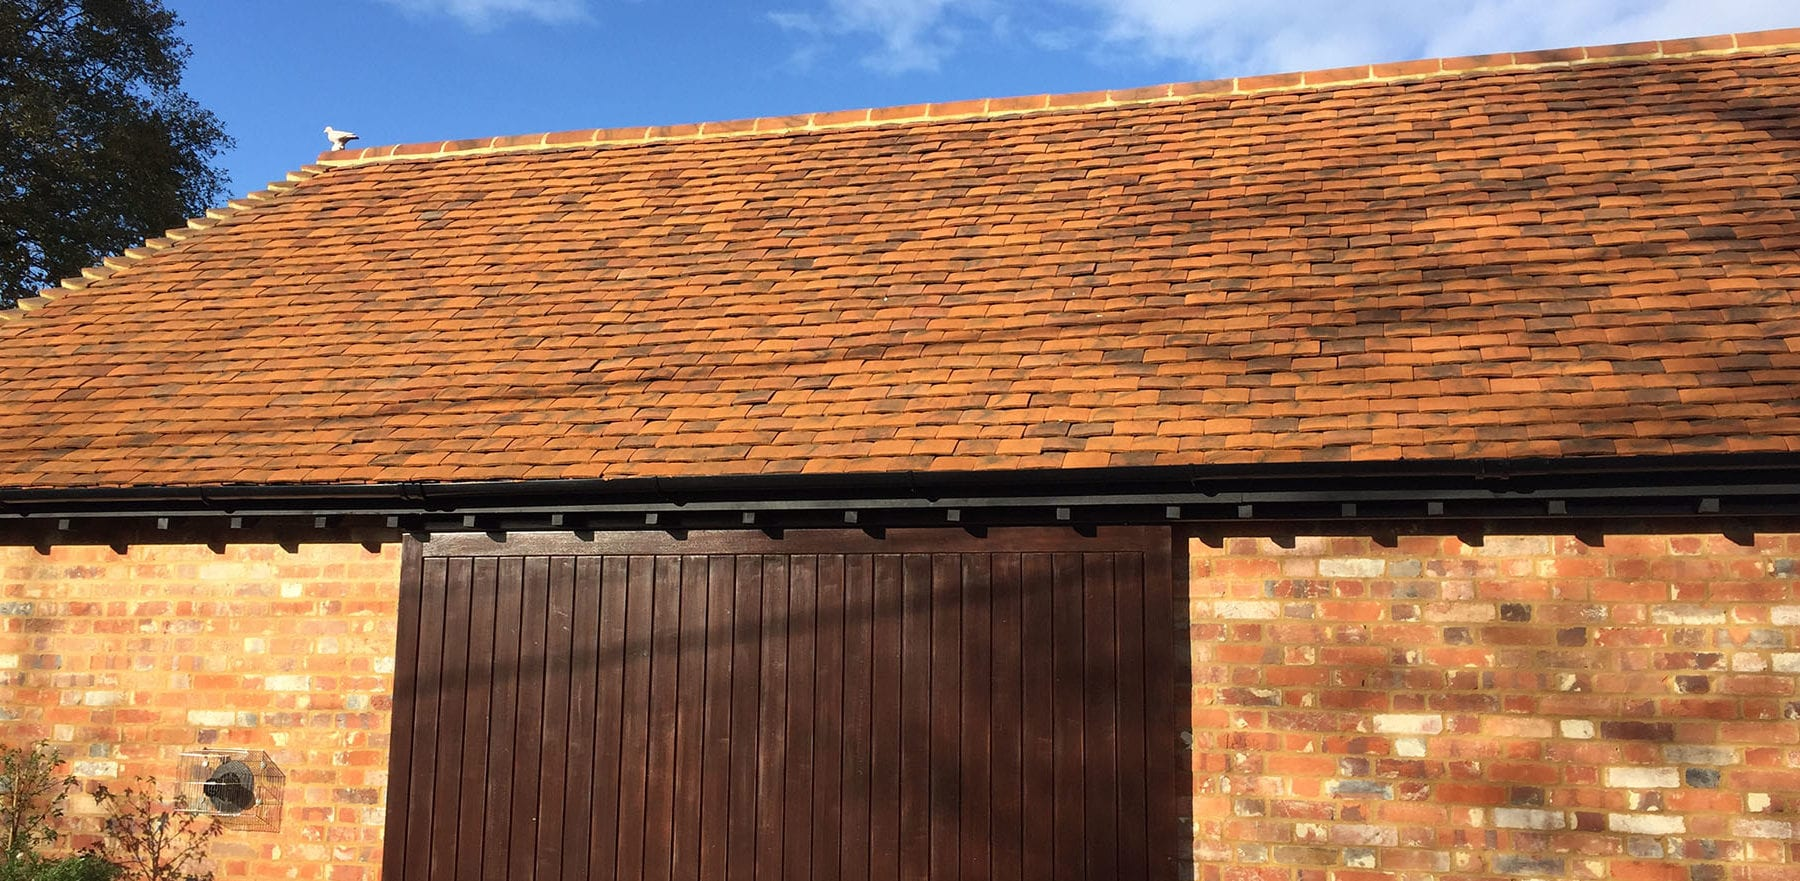 Lifestiles - Handmade Berkshire Clay Roof Tiles - Thatcham, England 2